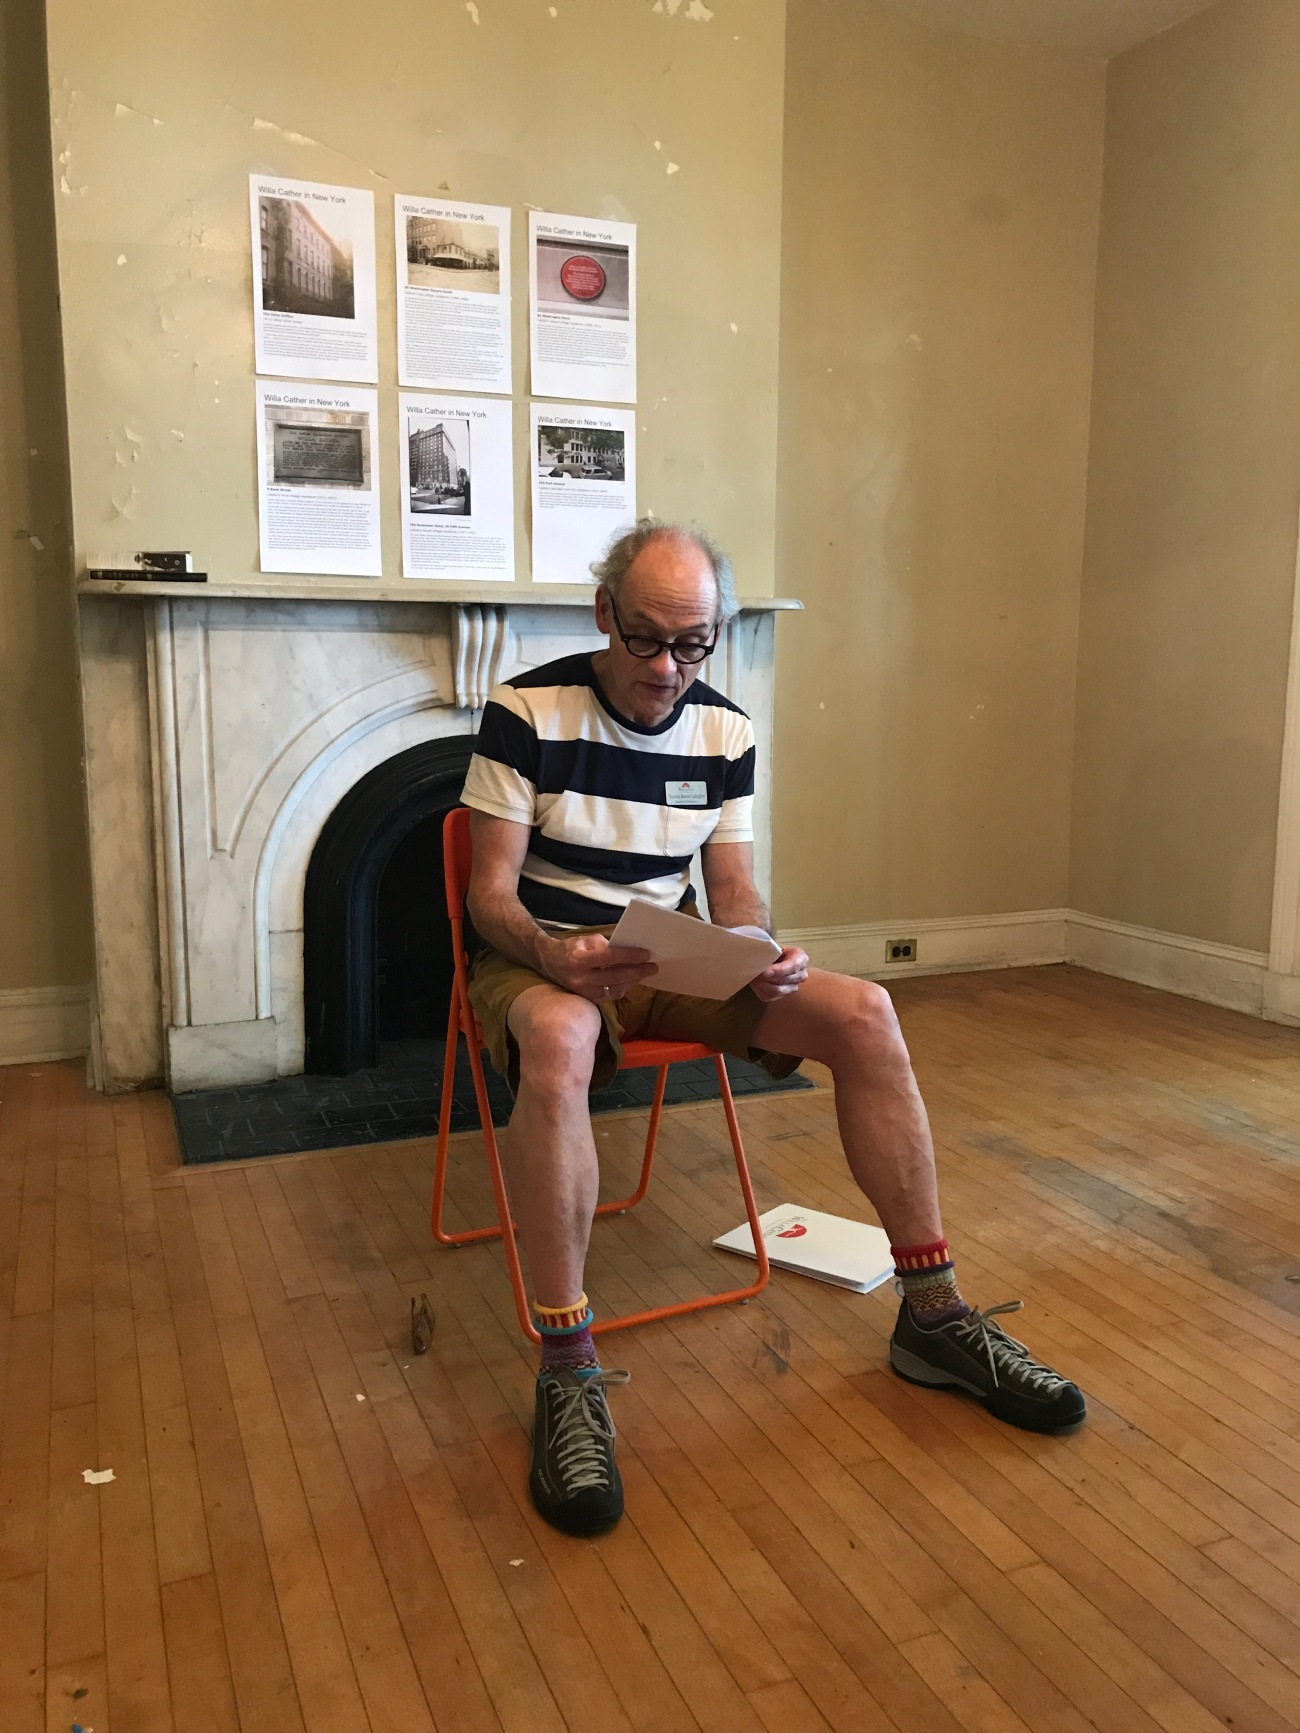 Tom Gallagher on Governors Island (WildmooBooks.com)